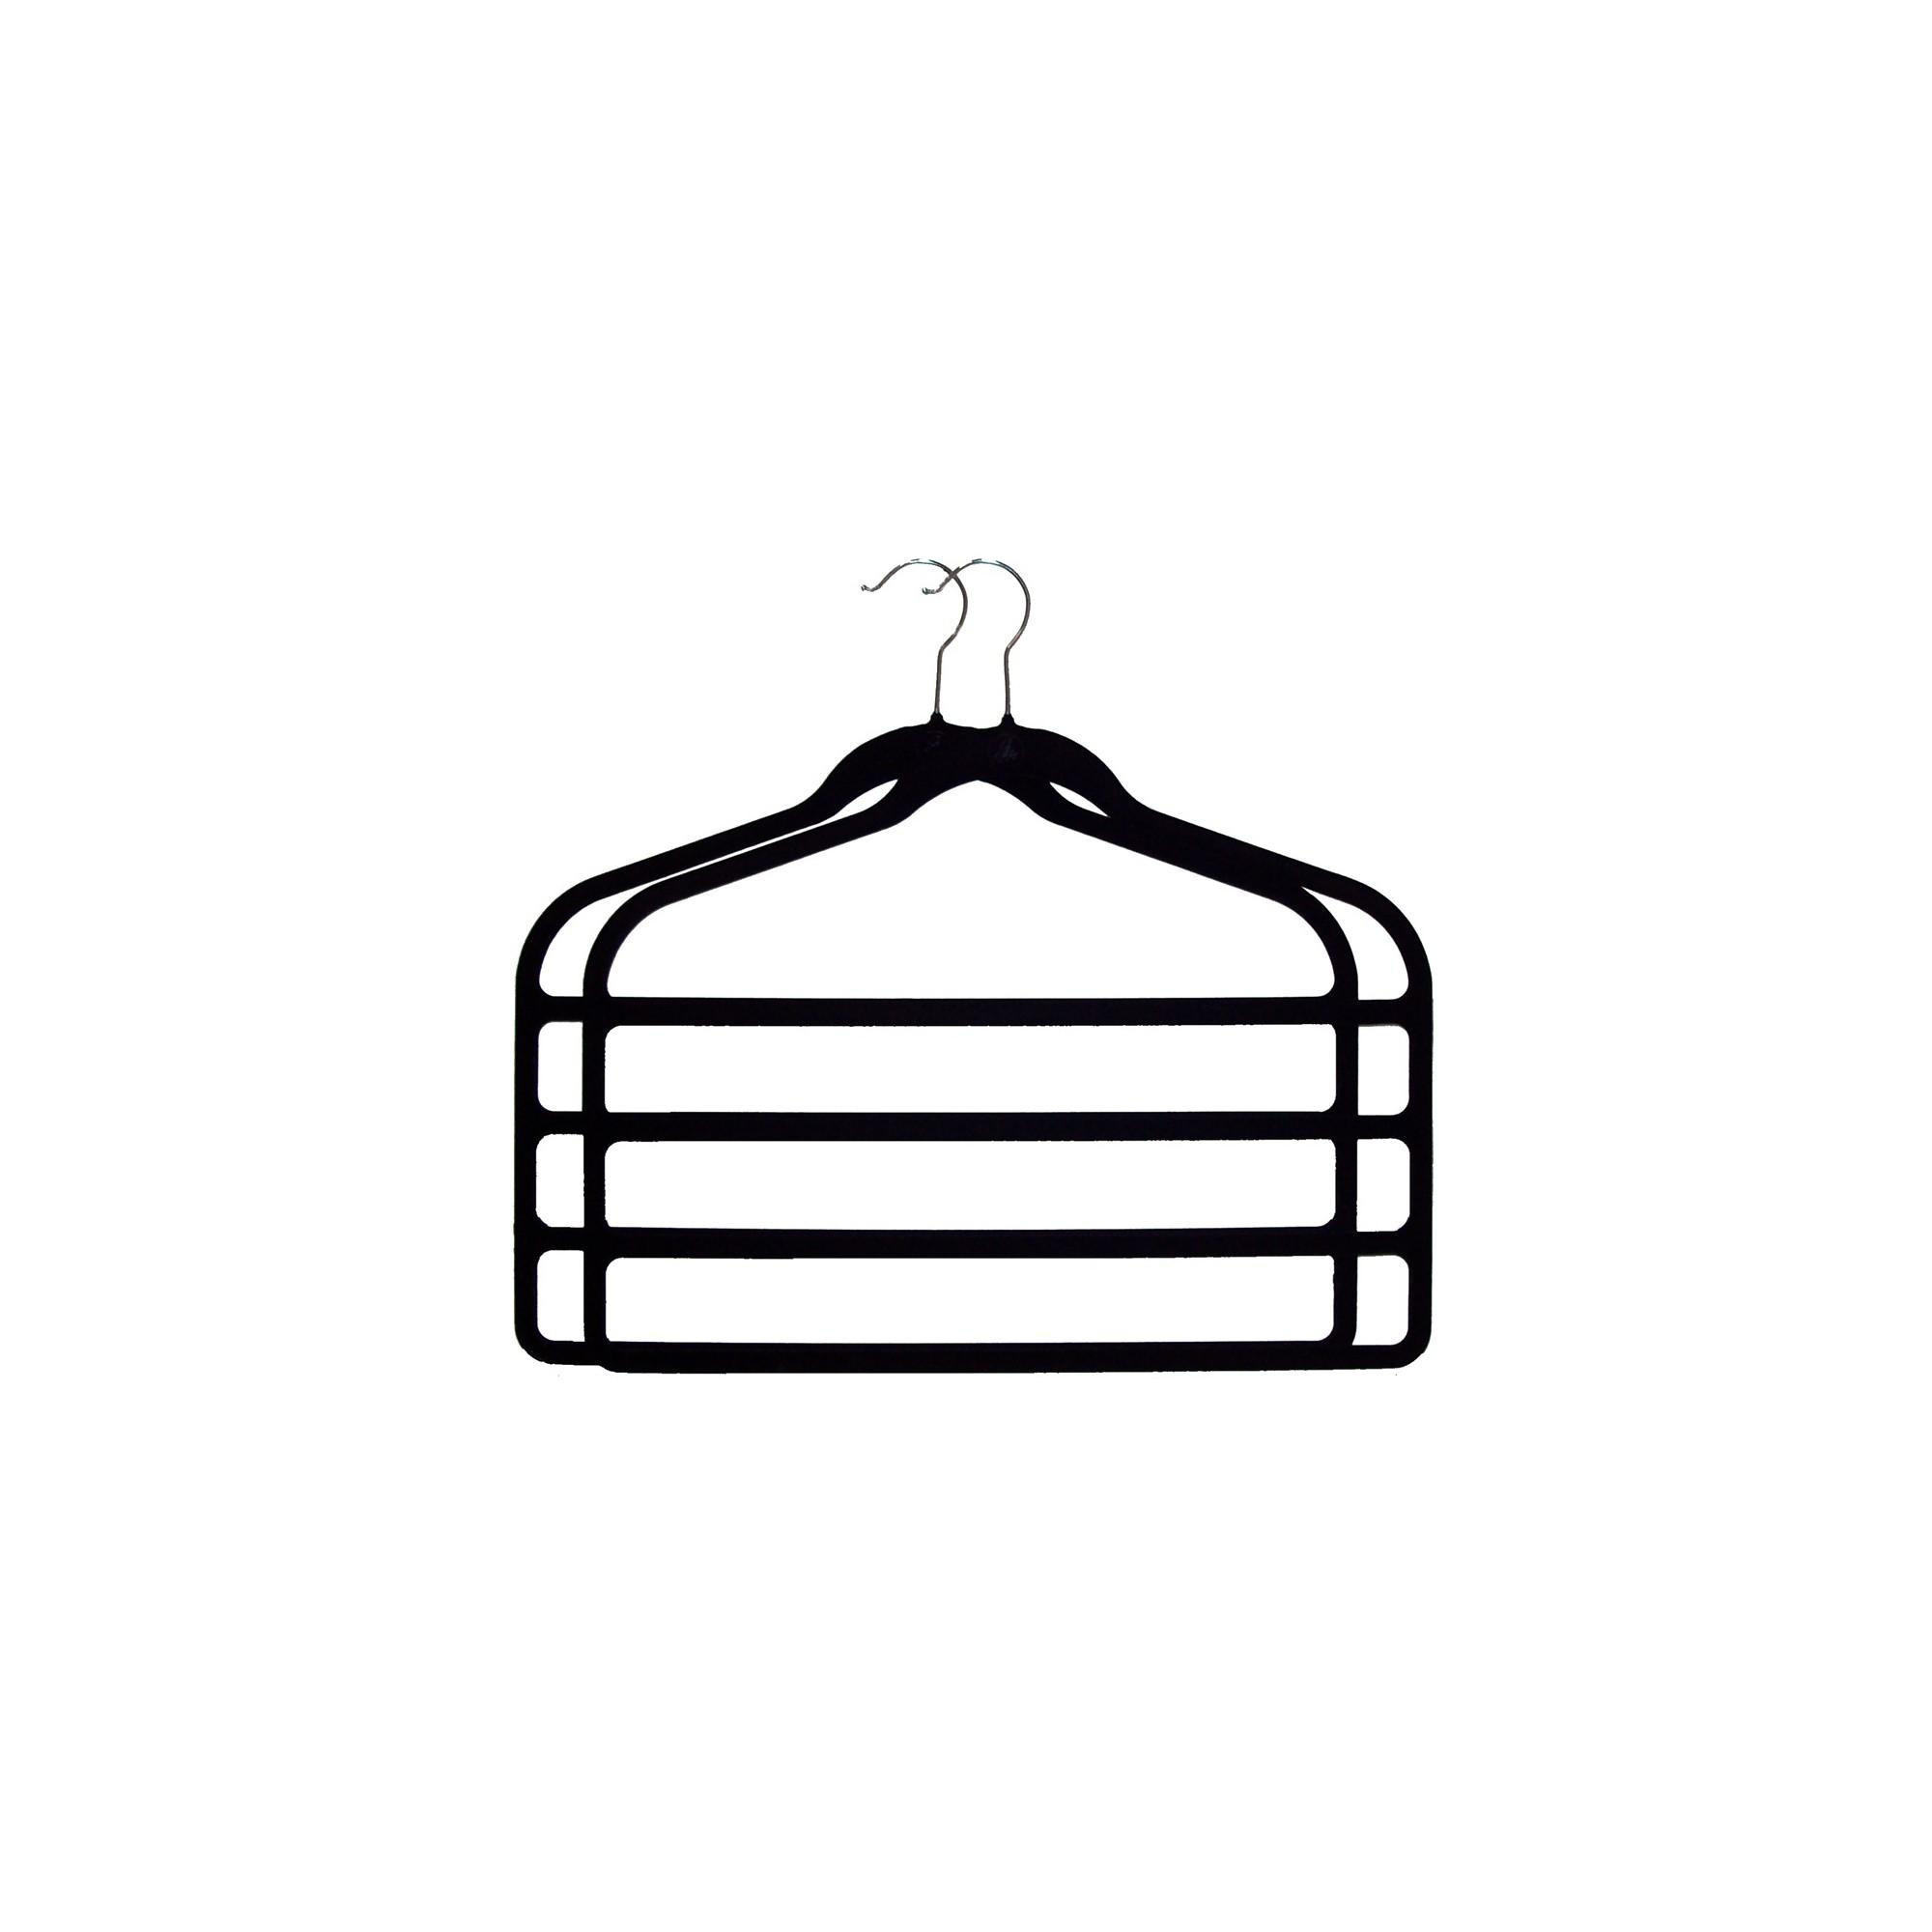 Huggable Hangers 2pc 4-Bar Hangers - Black